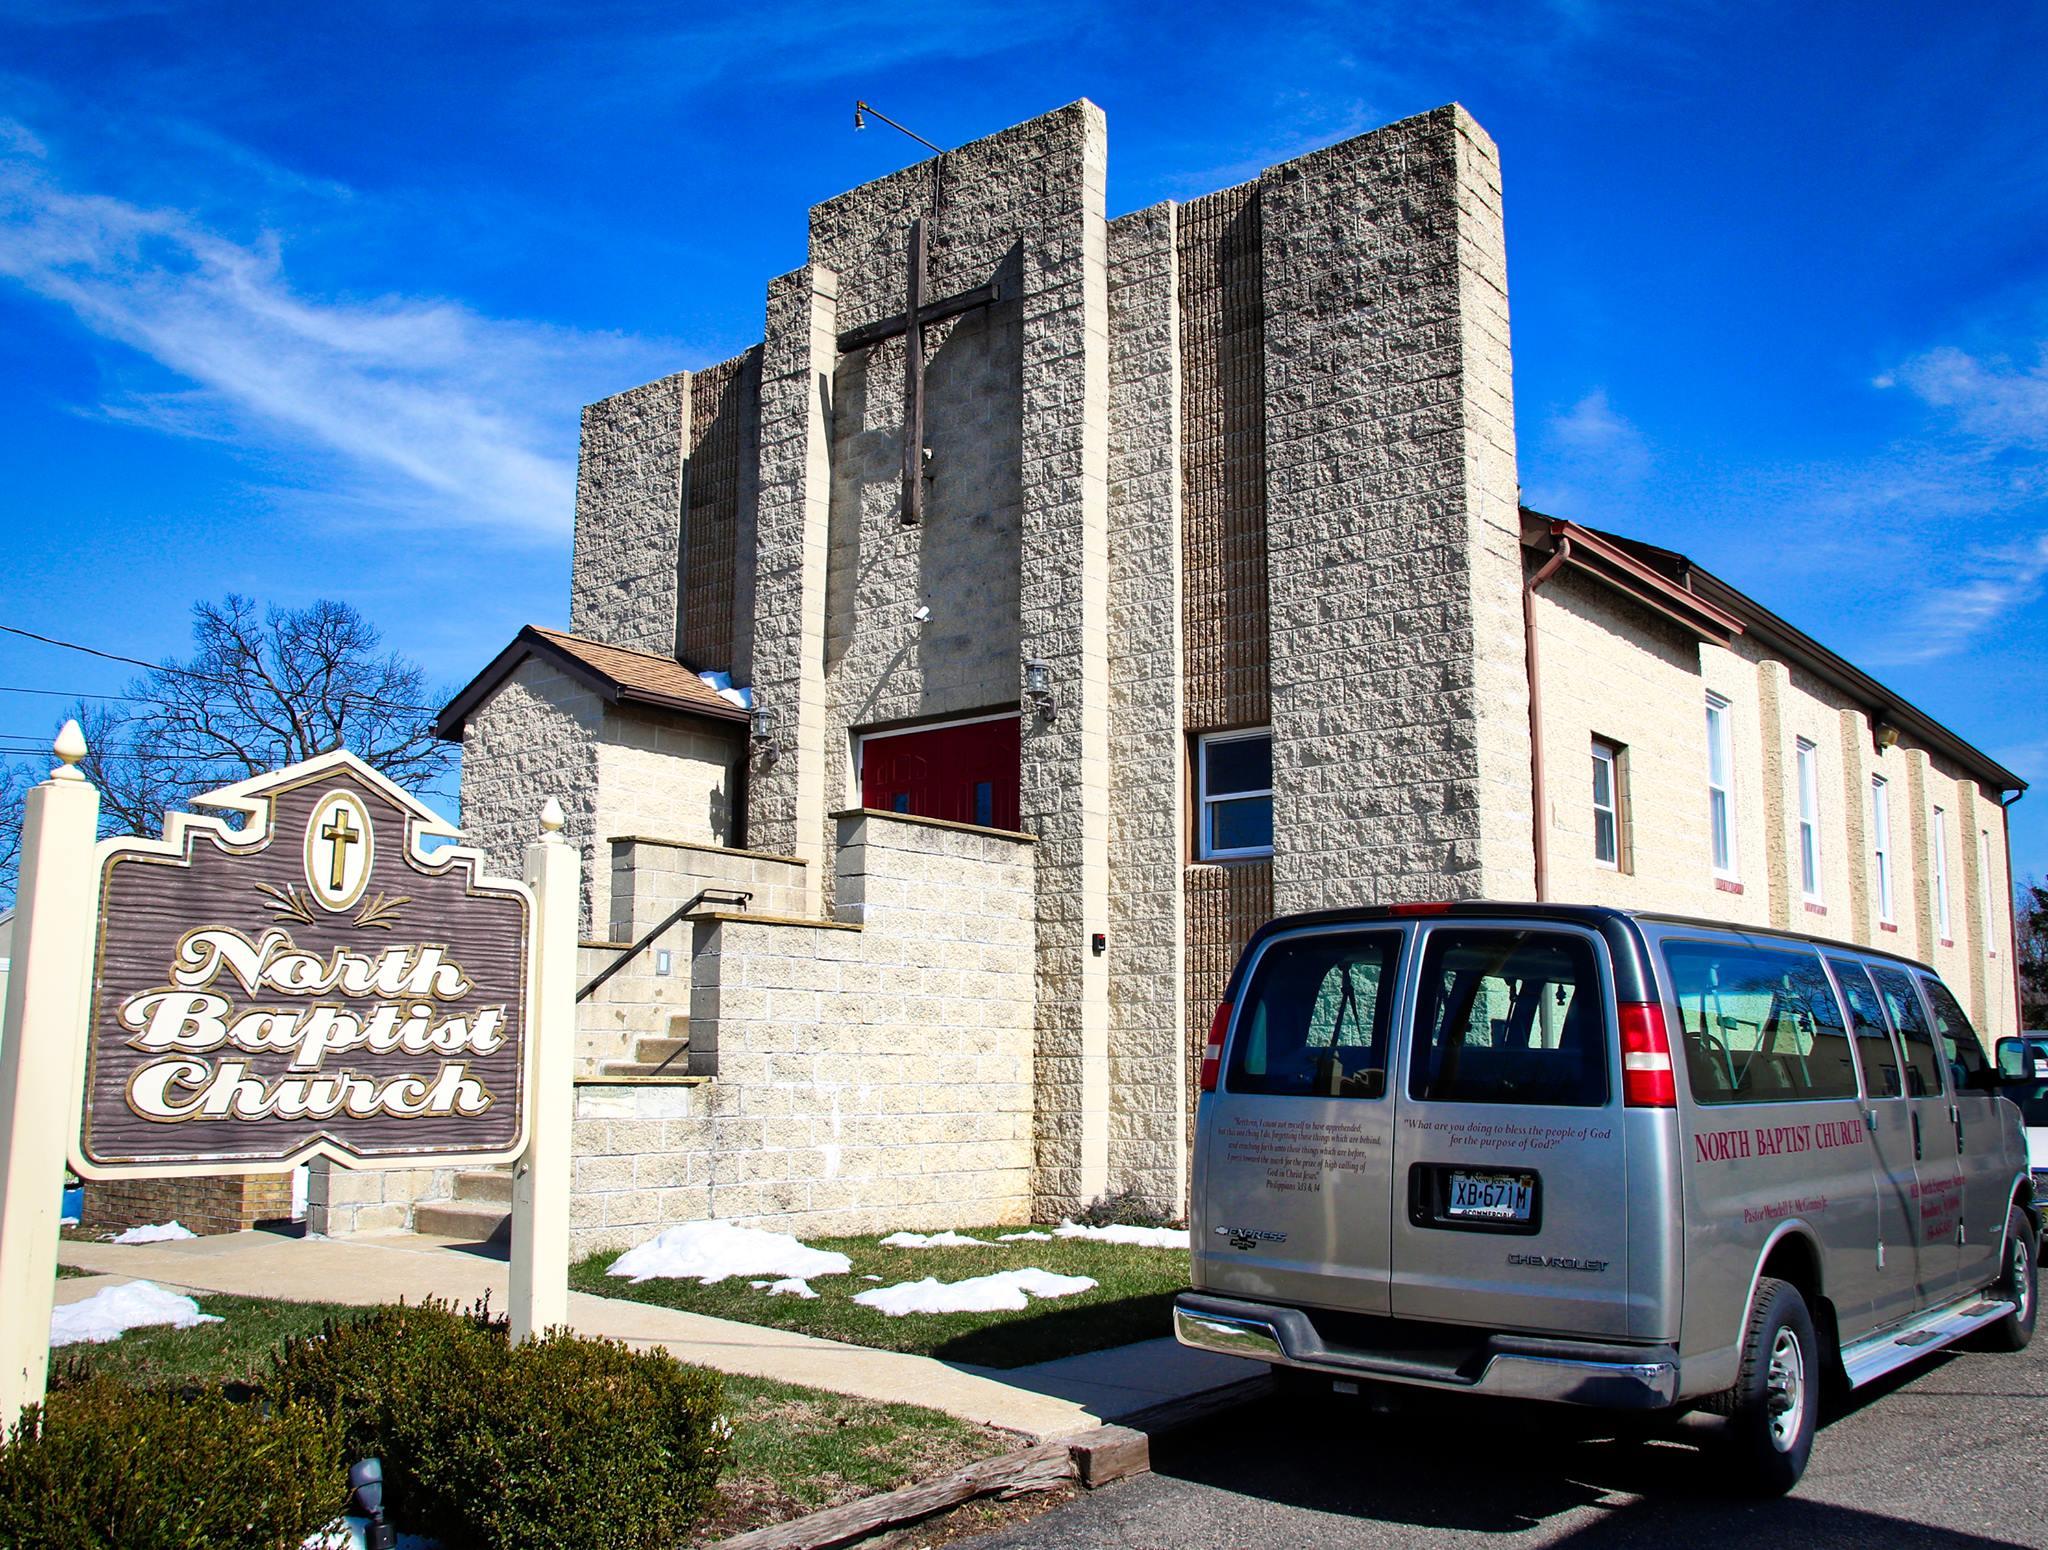 North Baptist Church